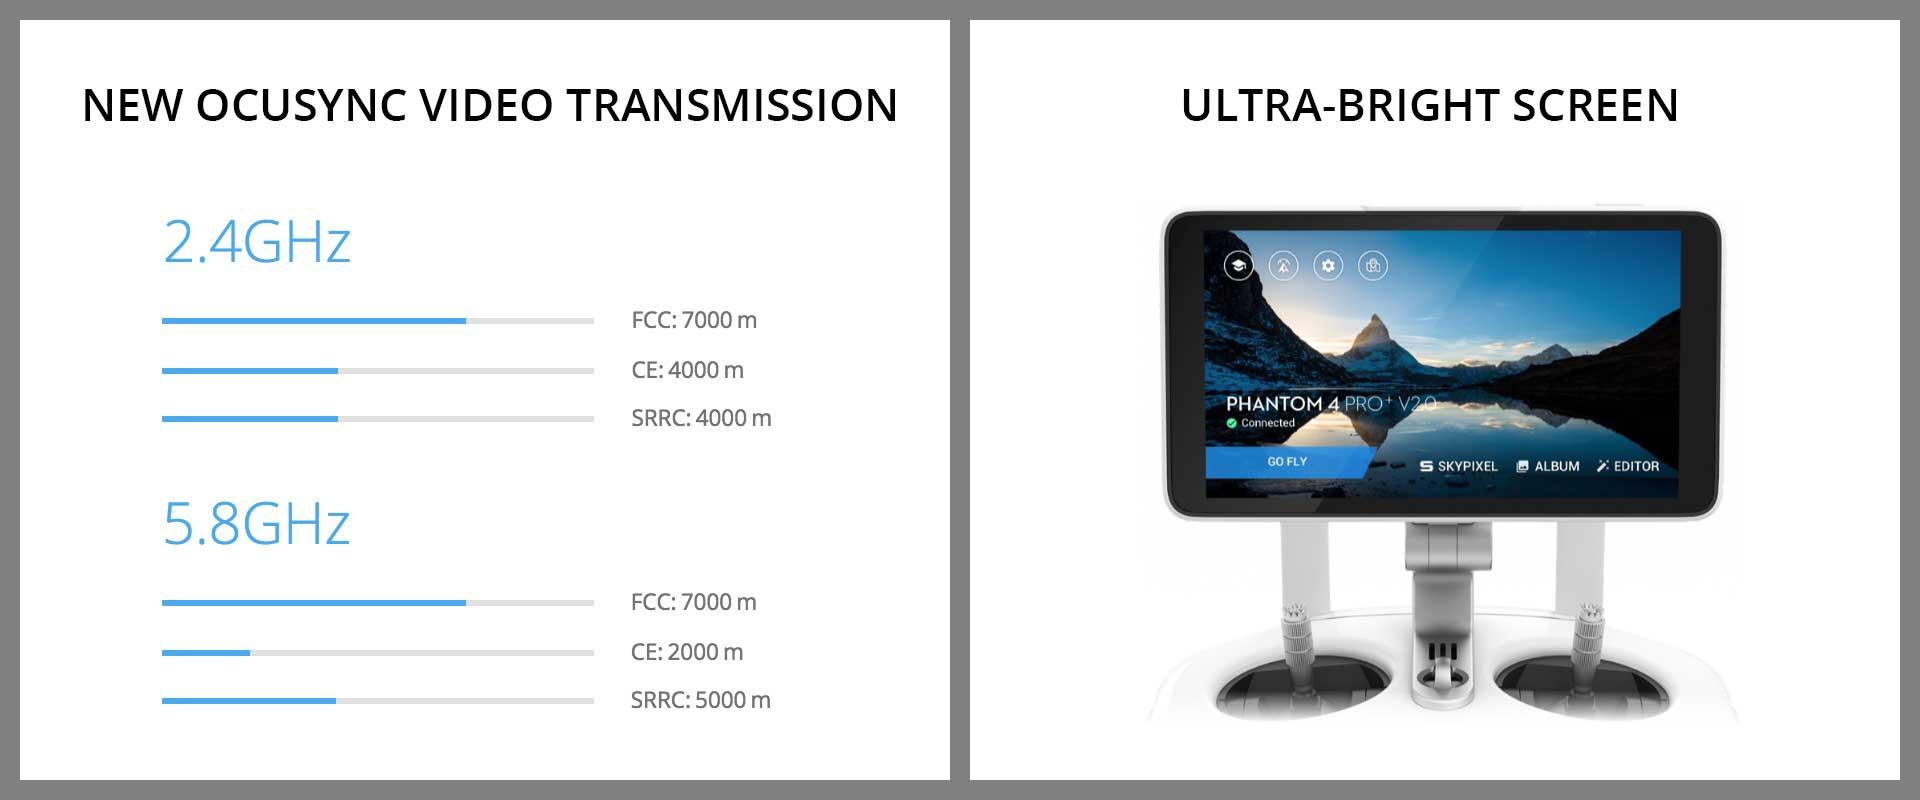 DJI Phantom 4 Pro V2.0 NEW OCUSYNC VIDEO TRANSMISSION, ULTRA-BRIGHT SCREEN.